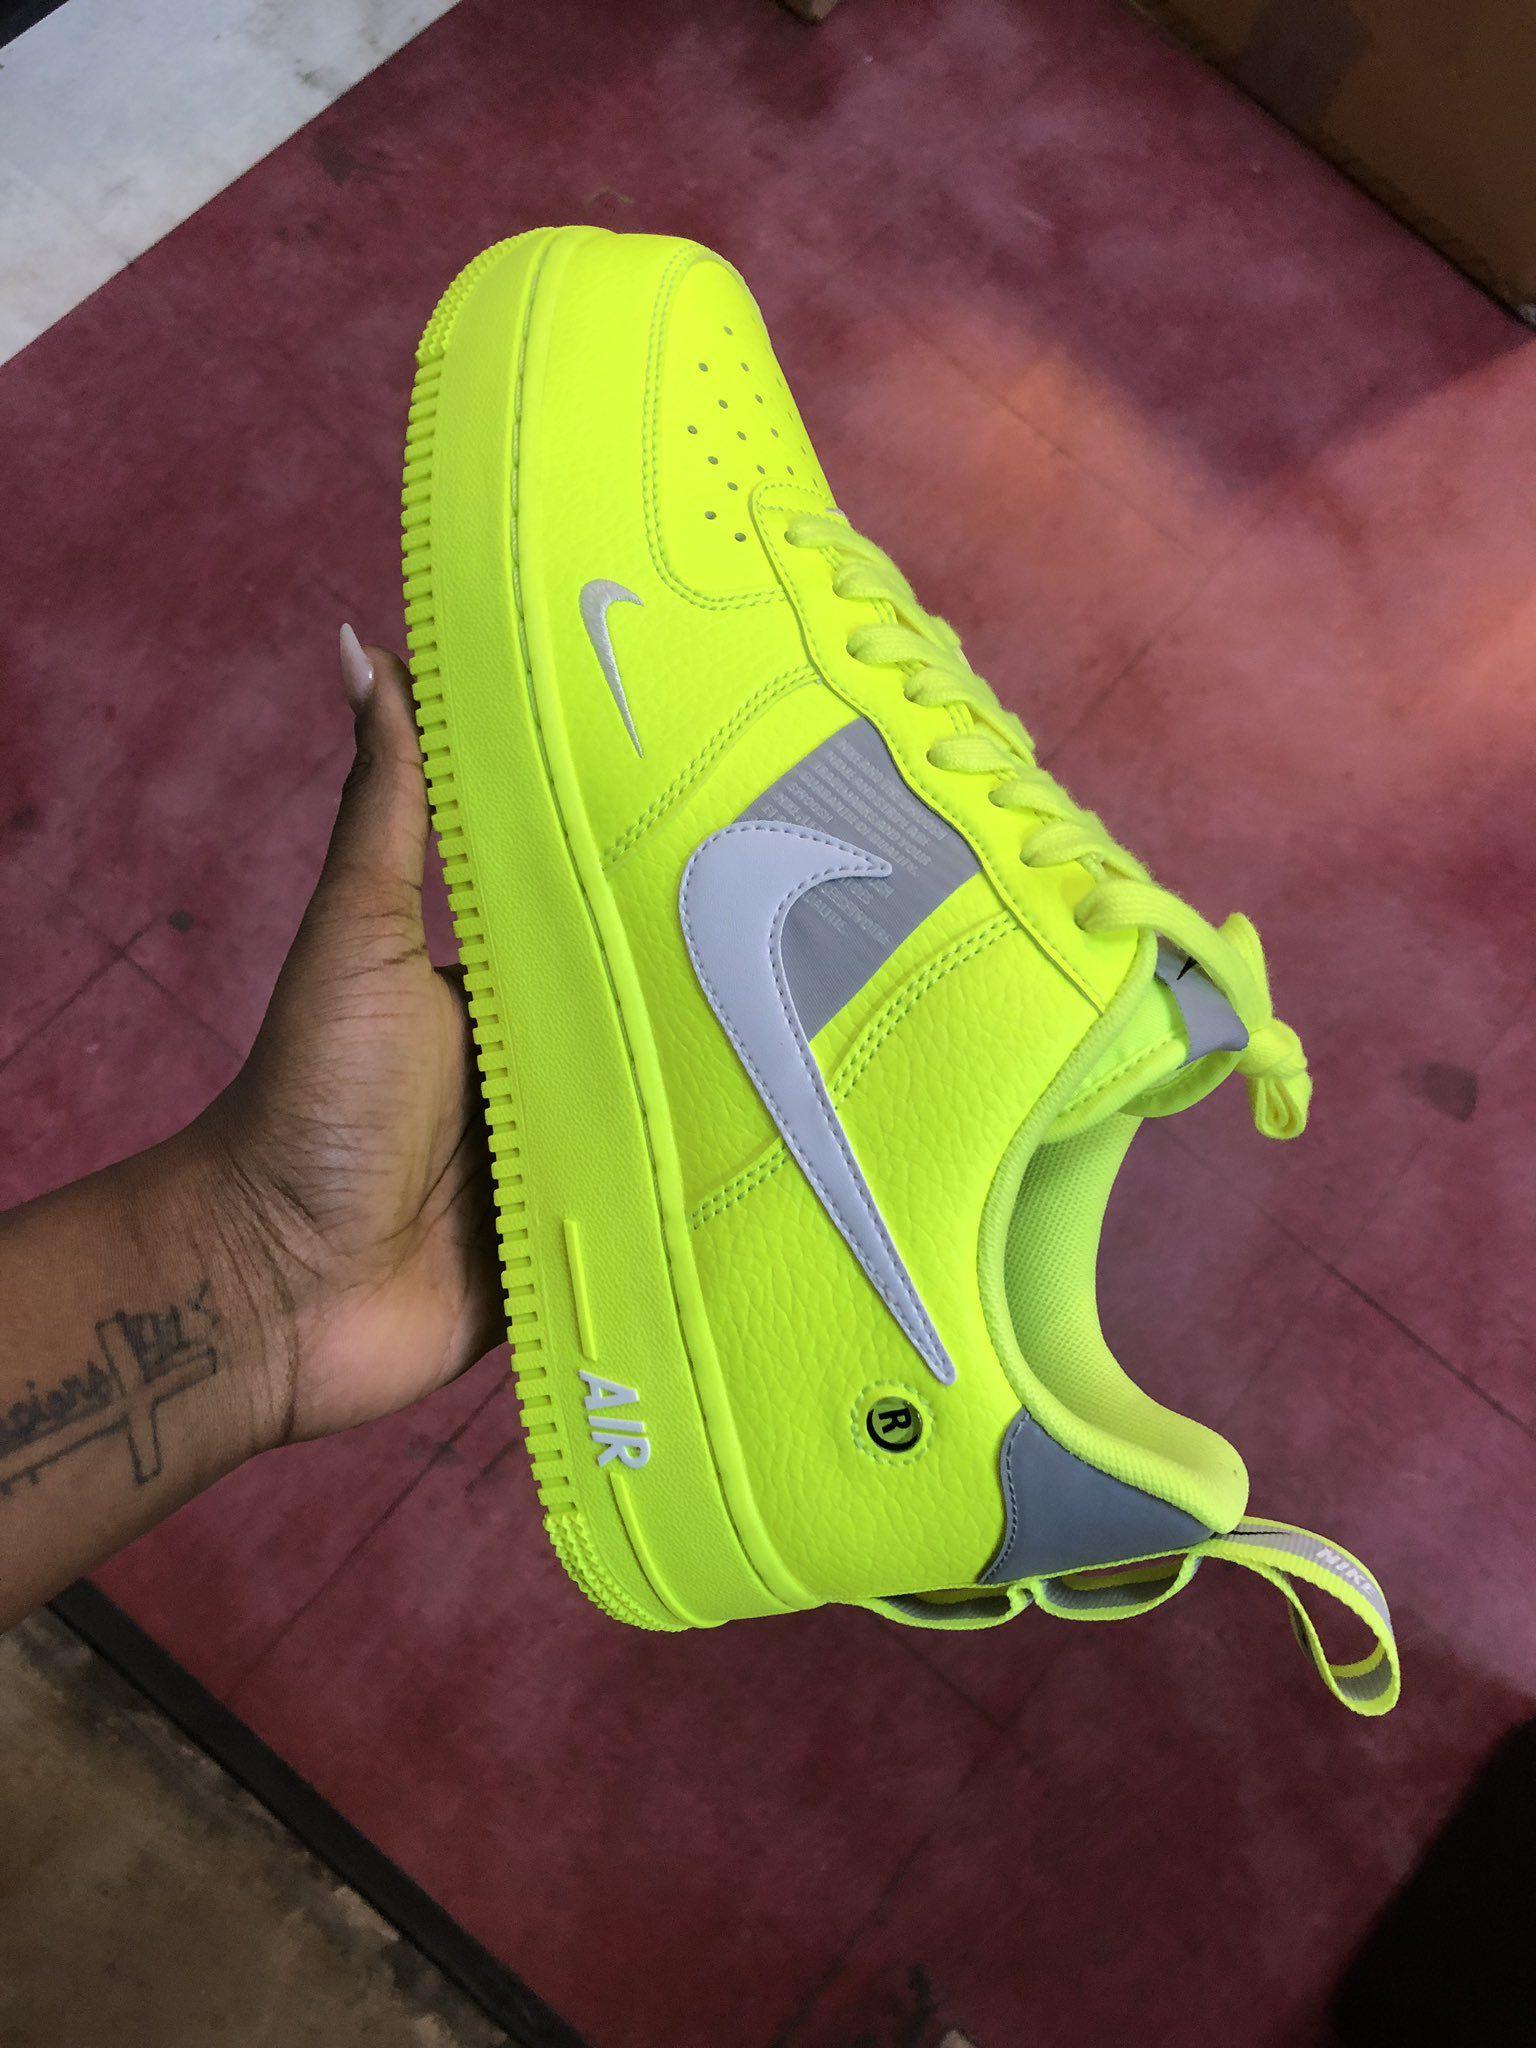 nike air force 1 verde fosforescente